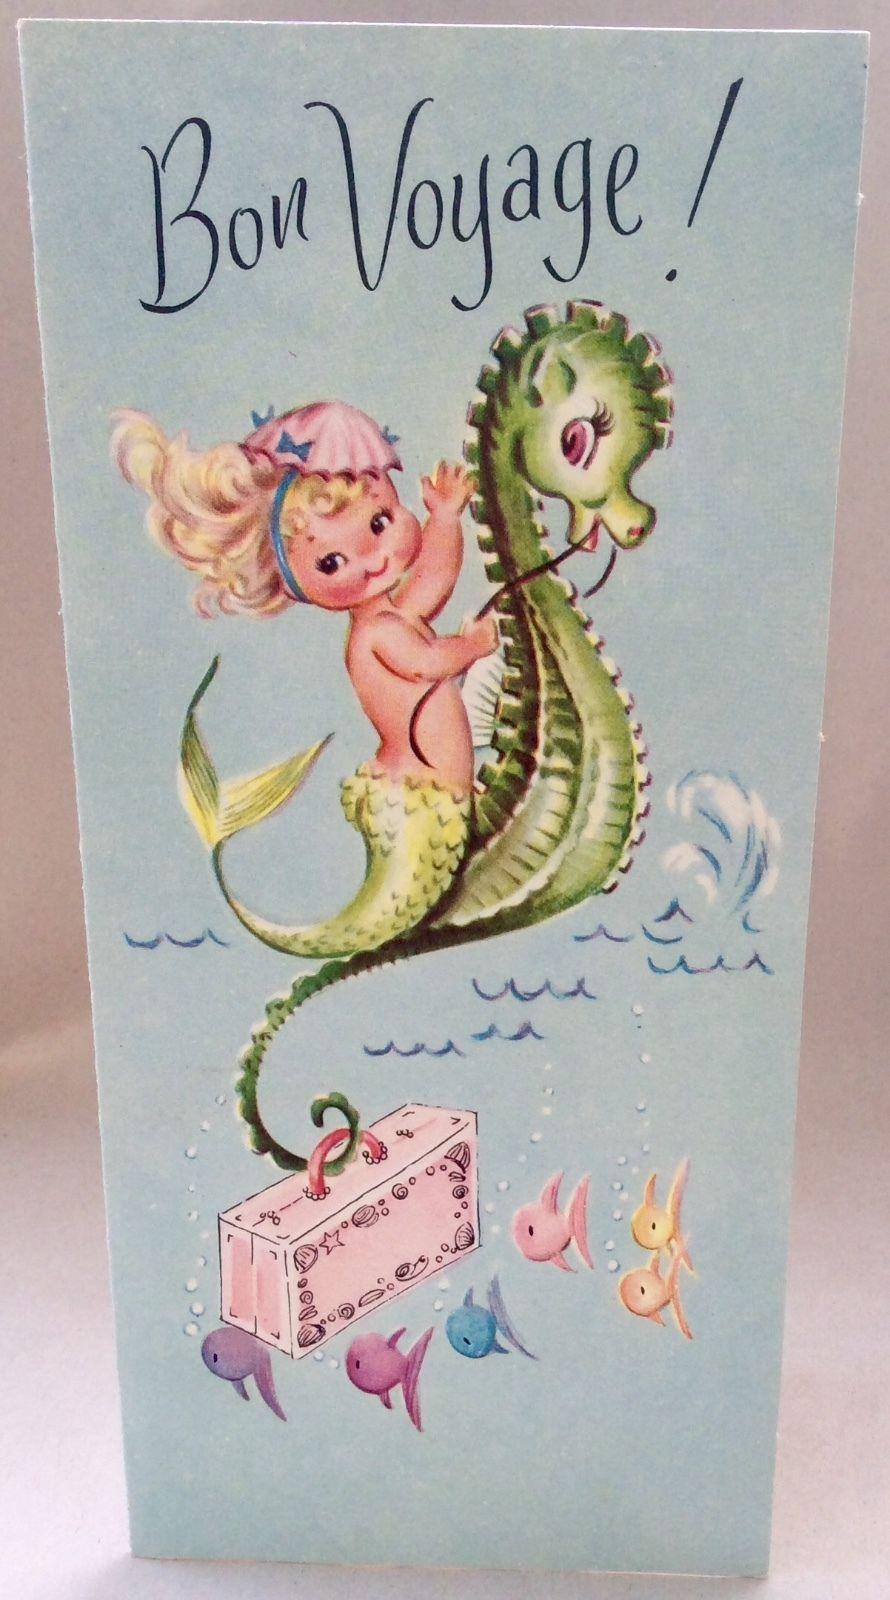 Httpebayitmunused adorable mermaid seahorse pink unused adorable mermaid seahorse pink suitcase vintage bon voyage greeting card in collectibles paper vintage greeting cards unused vintage kristyandbryce Image collections